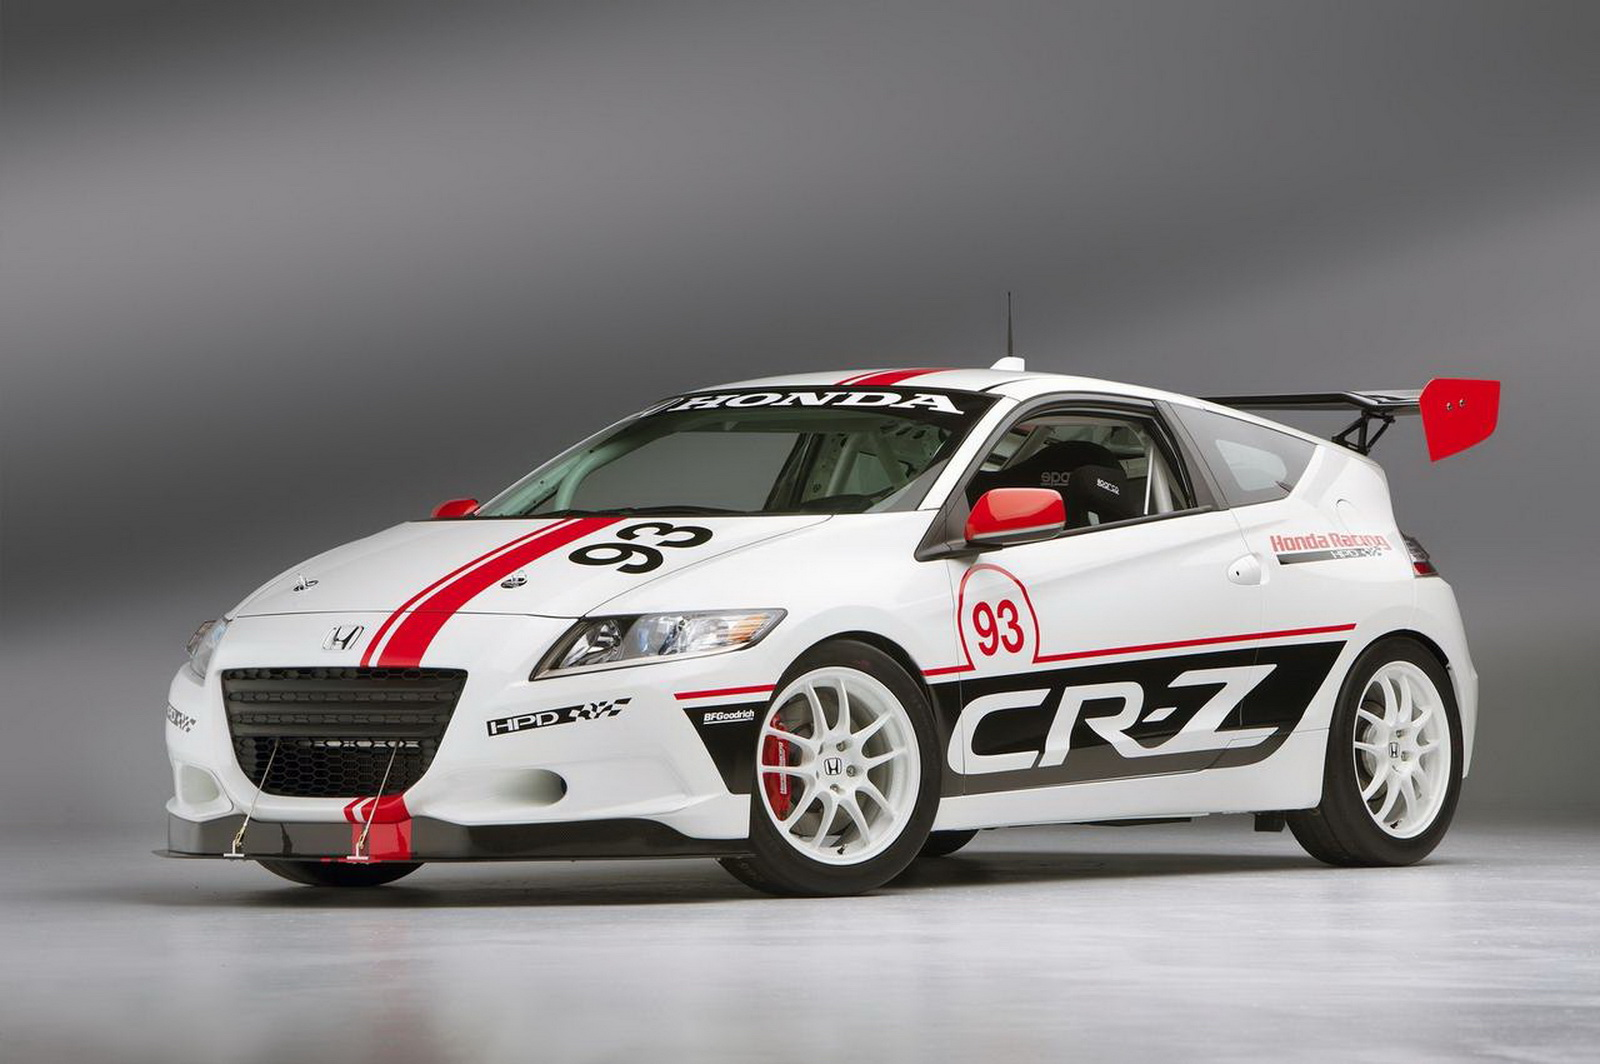 Honda Performance Developments CR Z Racer at Le Mans Auto Car 1600x1064